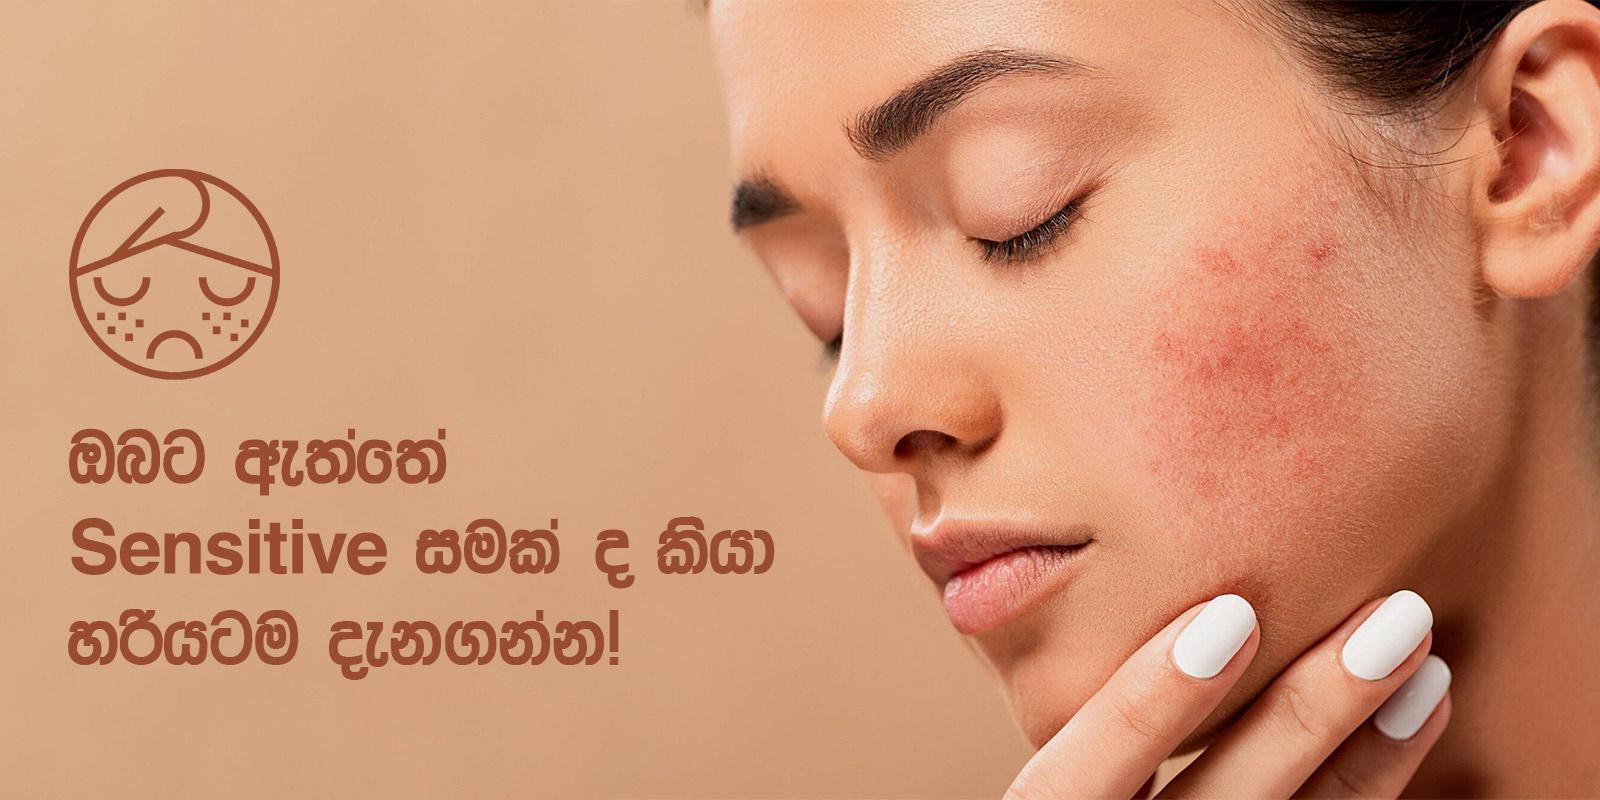 5 signs you have sensitive skin sinhala